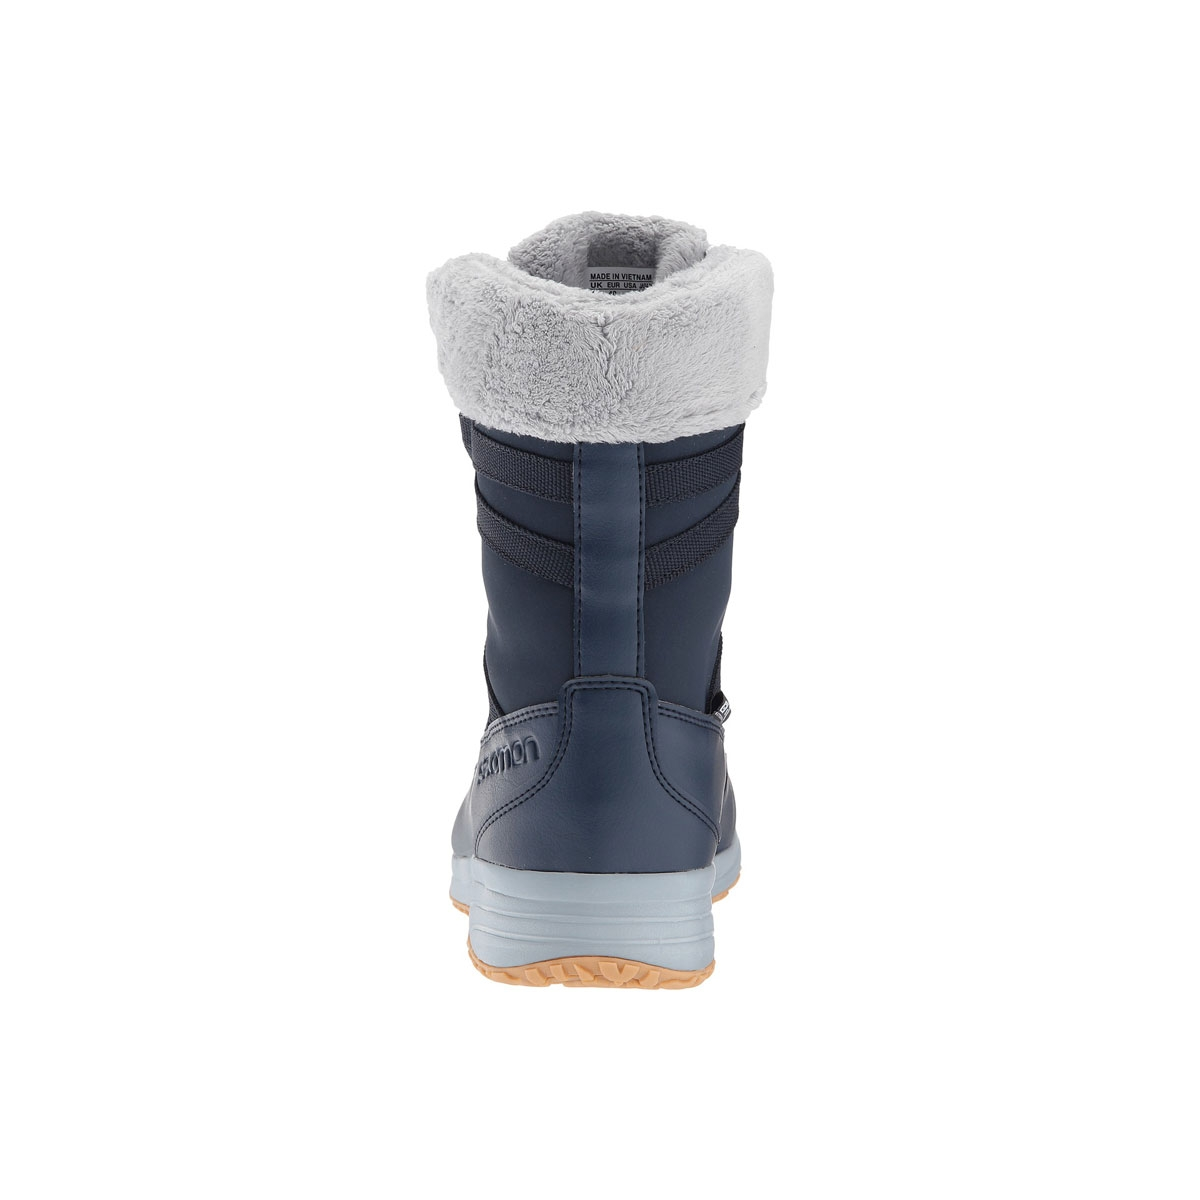 4bd4cbad8e8c ... Image of Salomon Heika LTR CS WP Womens Winter Boots (Women s) - Navy  Blazer ...